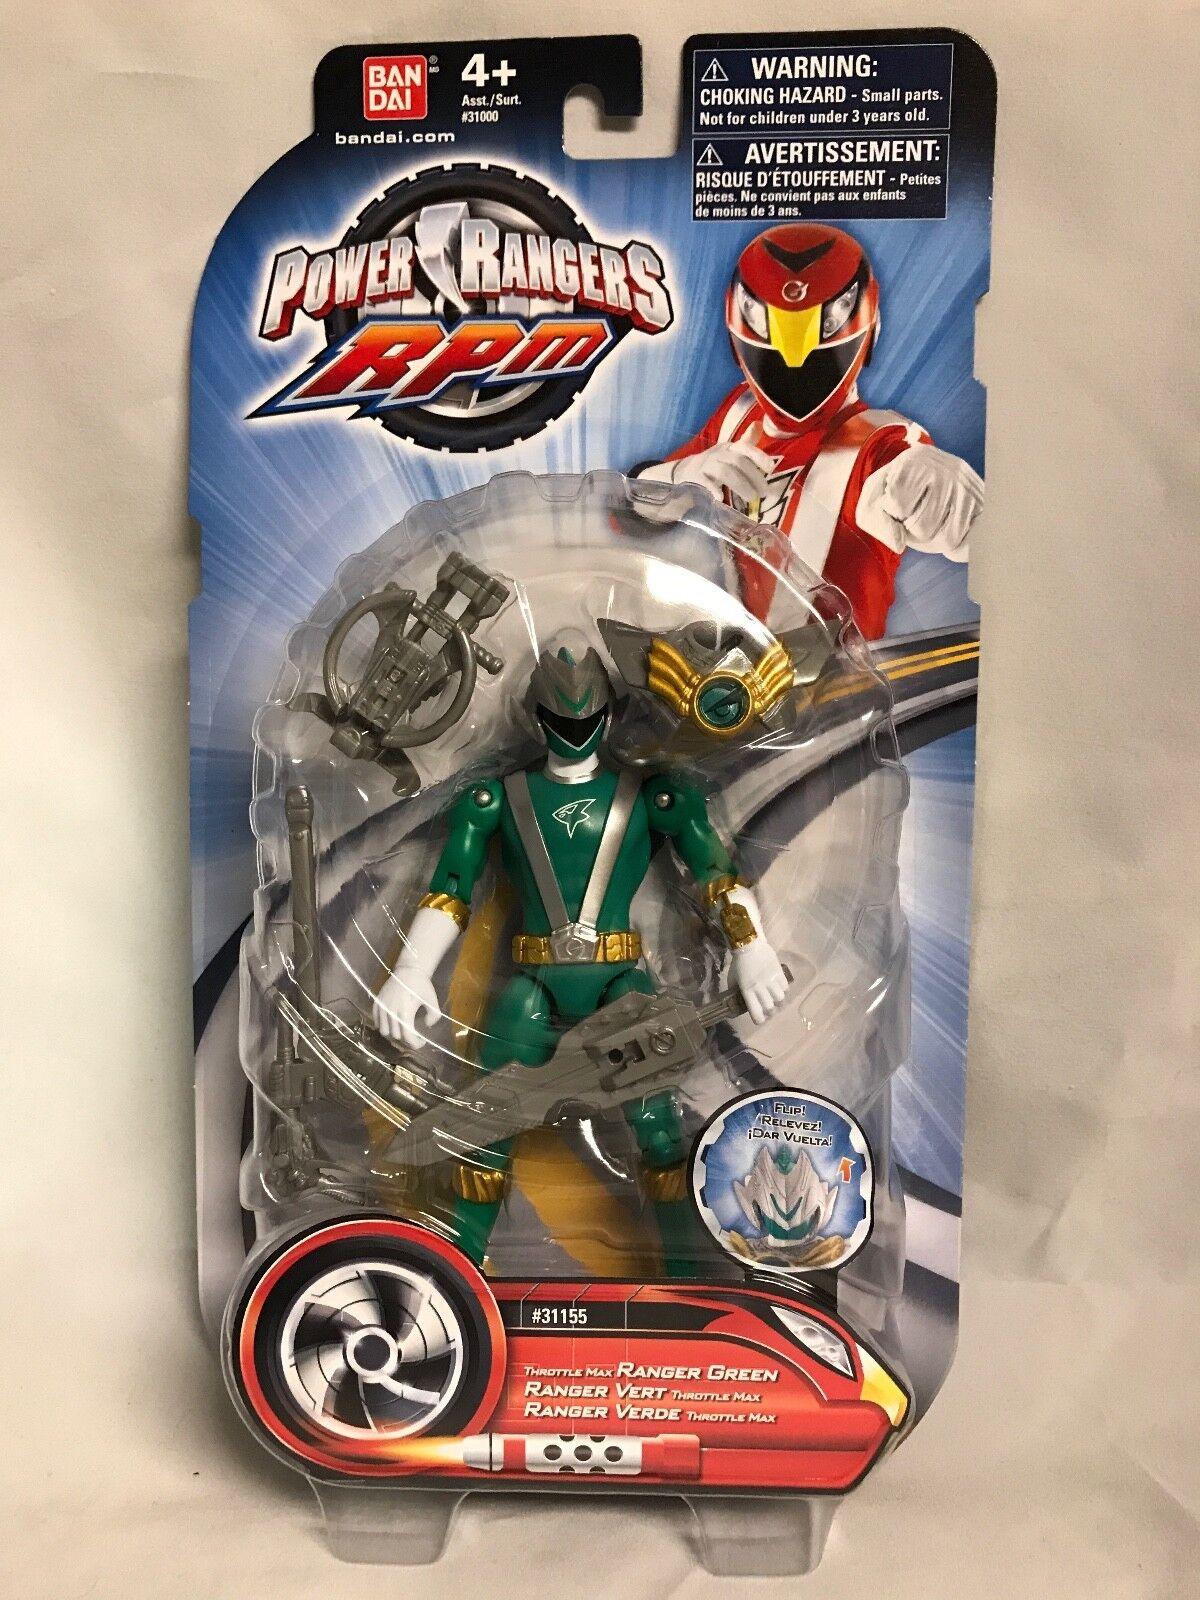 Bandai Power Rangers RPM Thredtle Max GREEN Action Figure - Sealed